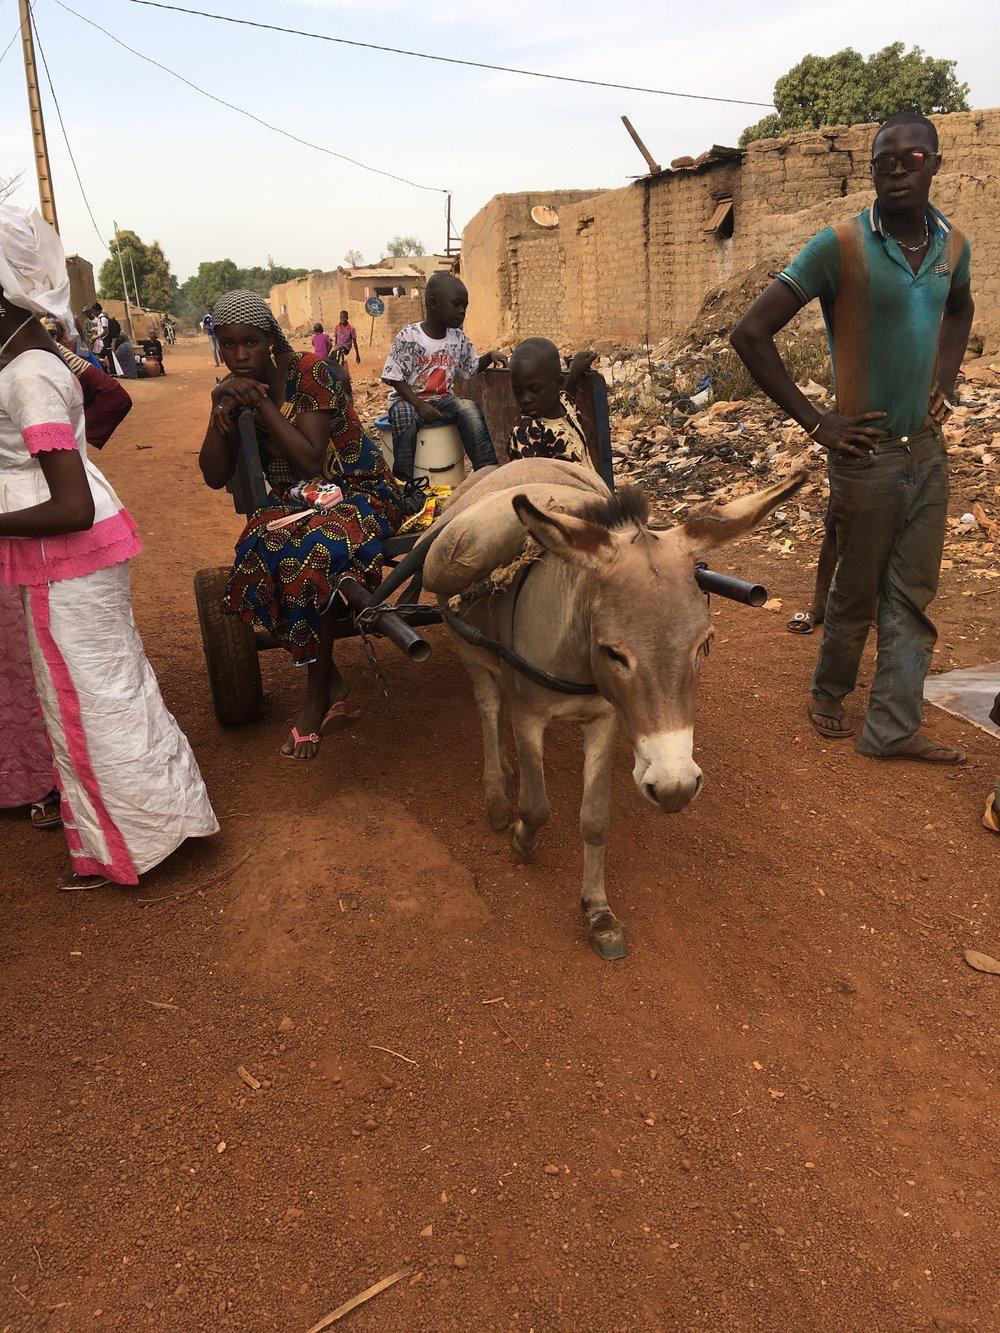 Oh the hard-working donkeys of Mali!